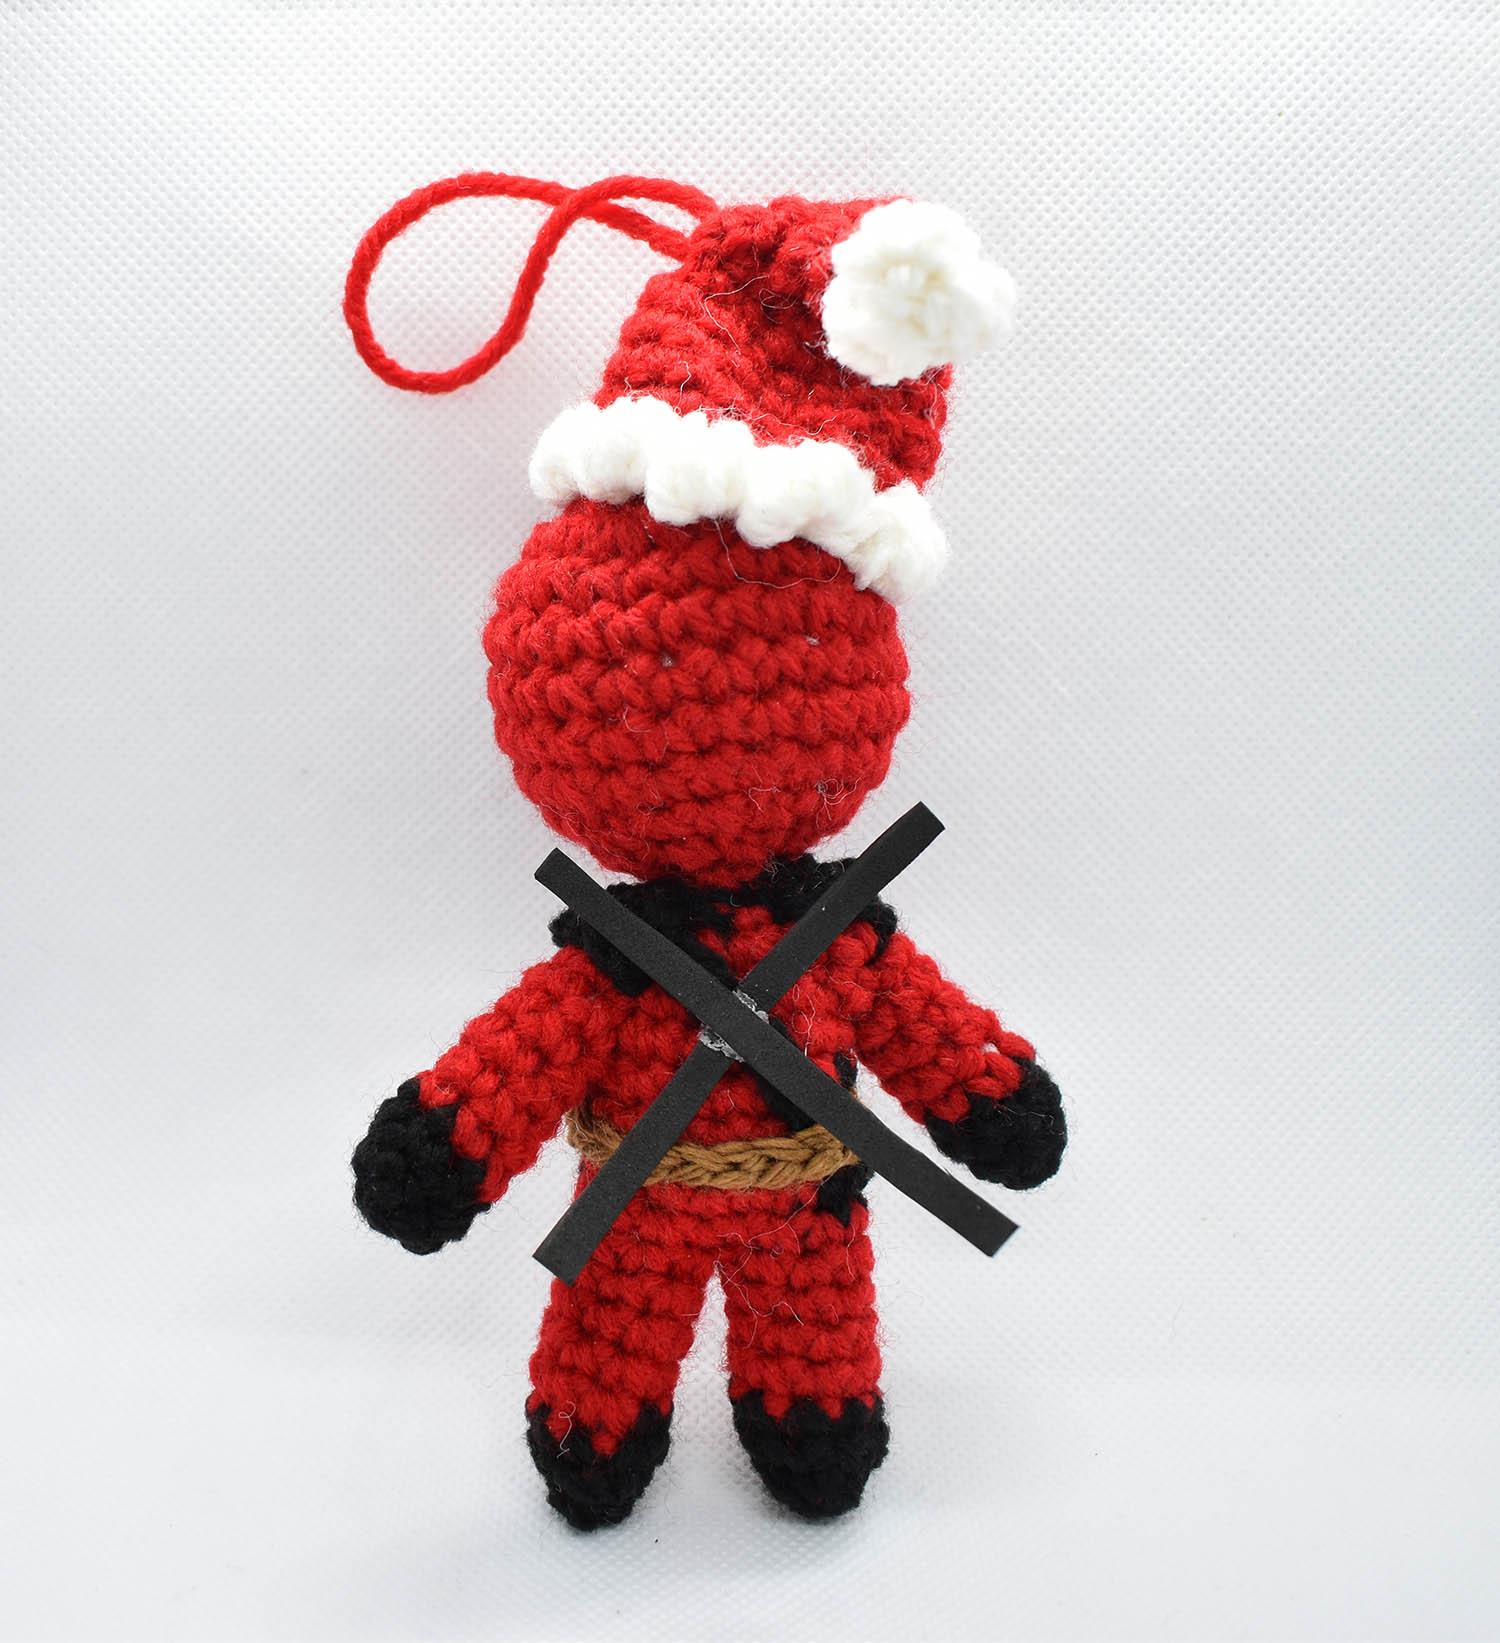 Santa Applique - PDF Crochet Pattern - Instant Download - Embellishment  Hairclip Ornament scrapbooking Christmas Tree Accessories   Christmas  crochet, Crochet winter, Christmas crafts   1643x1500